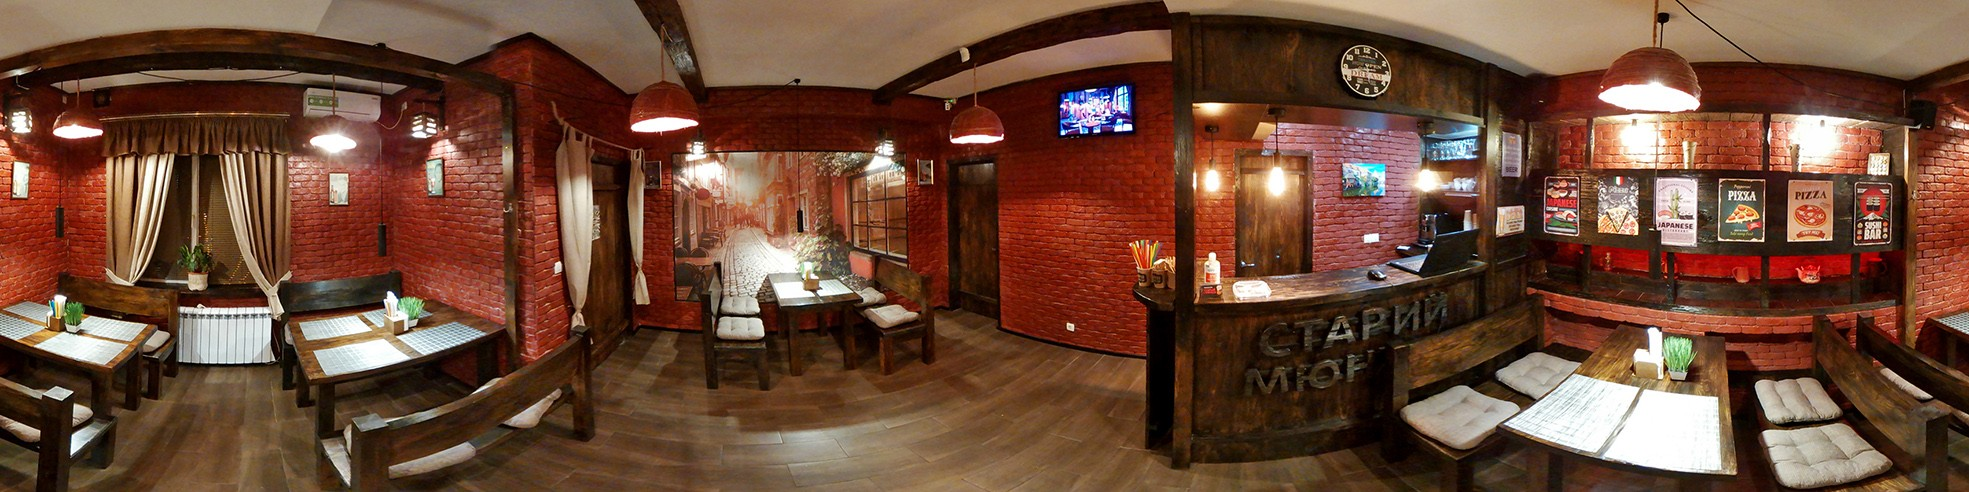 Sushi Pub Старый Мюнхен-доставка суши и пиццы в Никополе